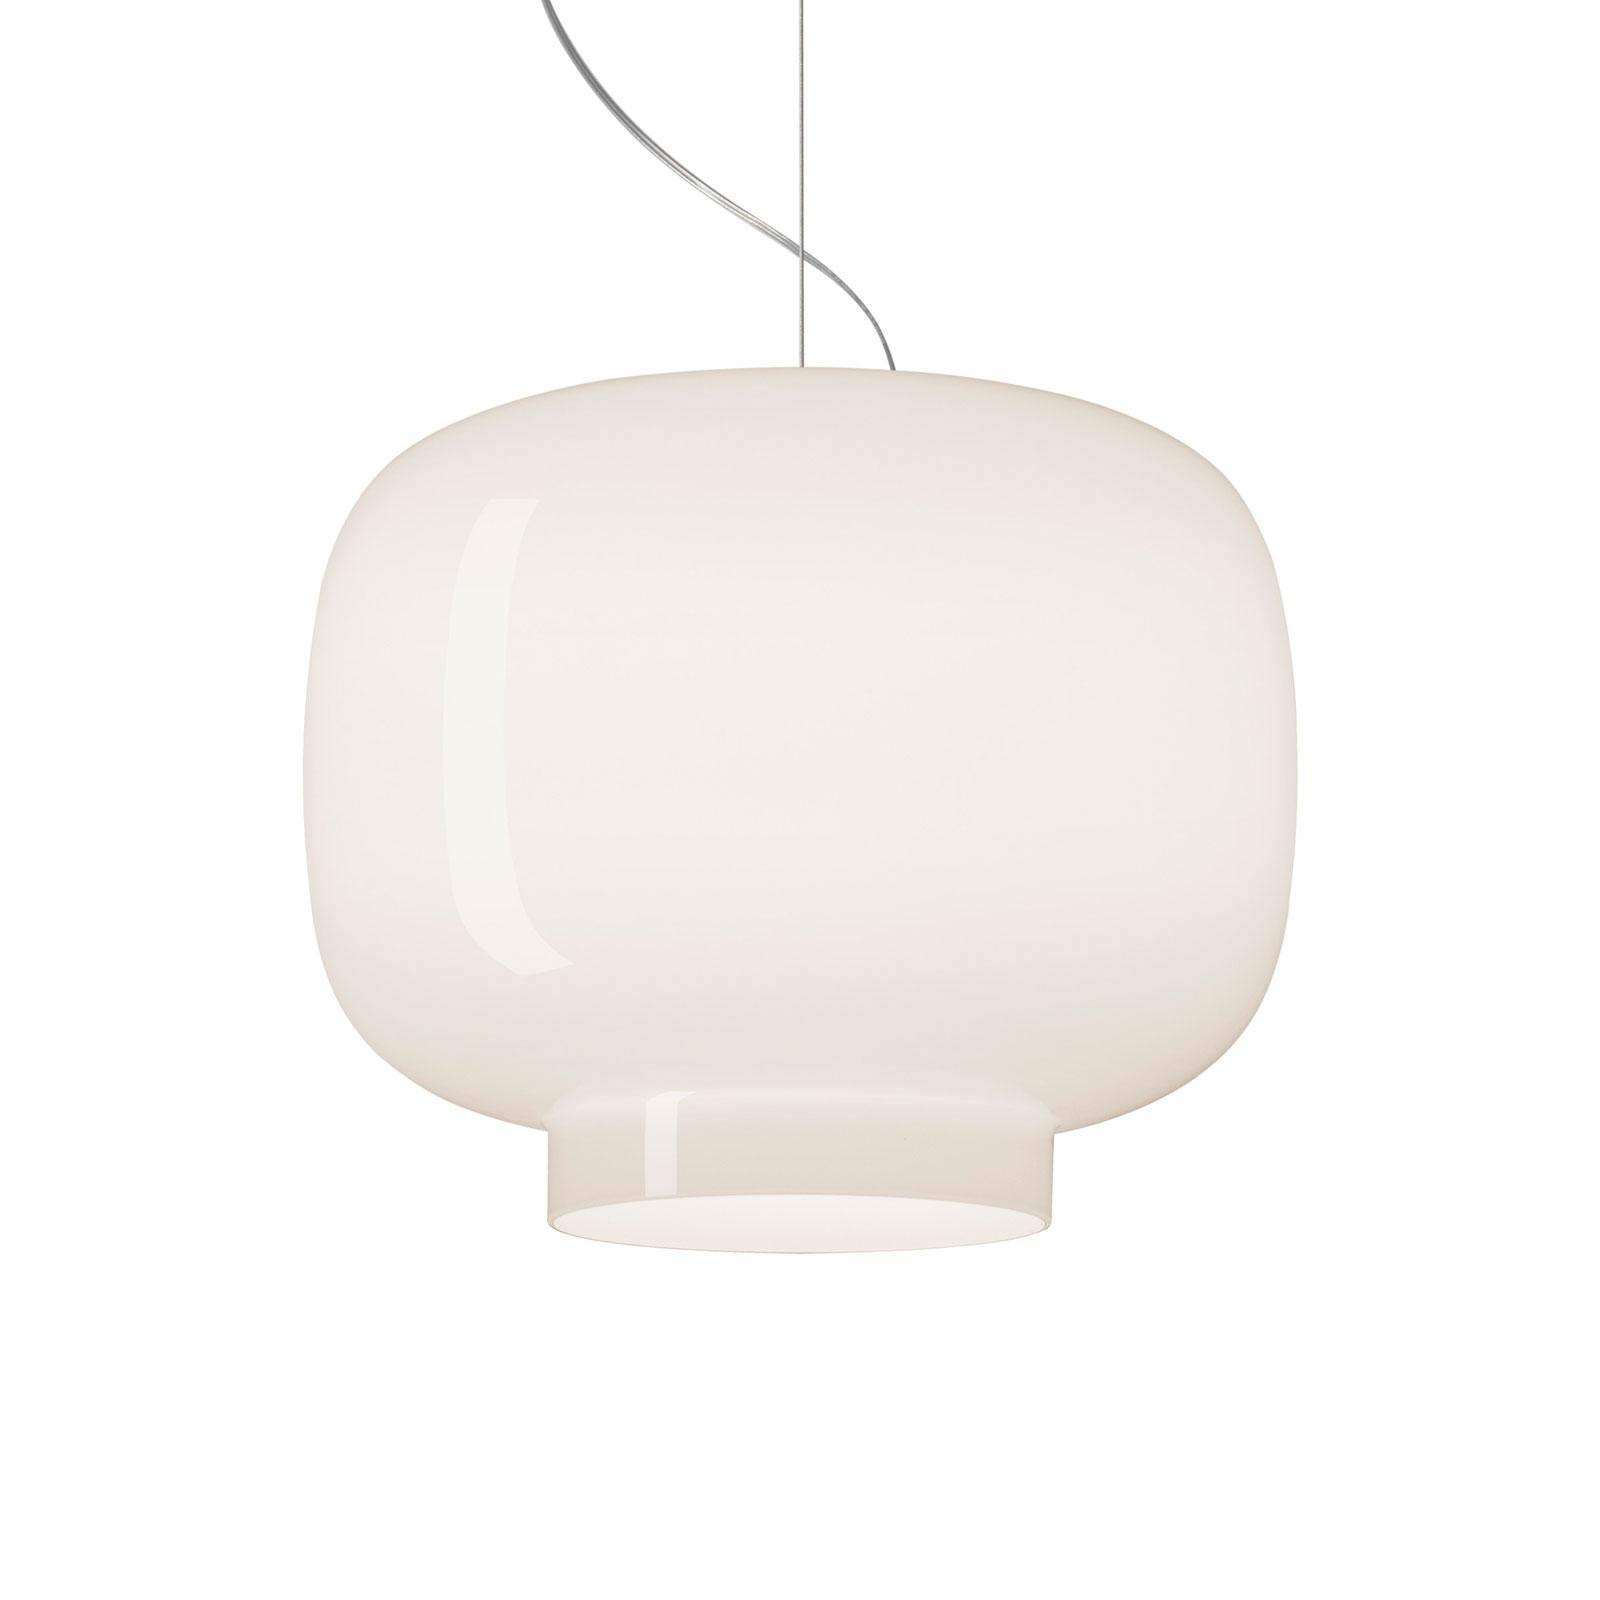 Foscarini Chouchin Bianco 3 MyLight LED-Hängelampe